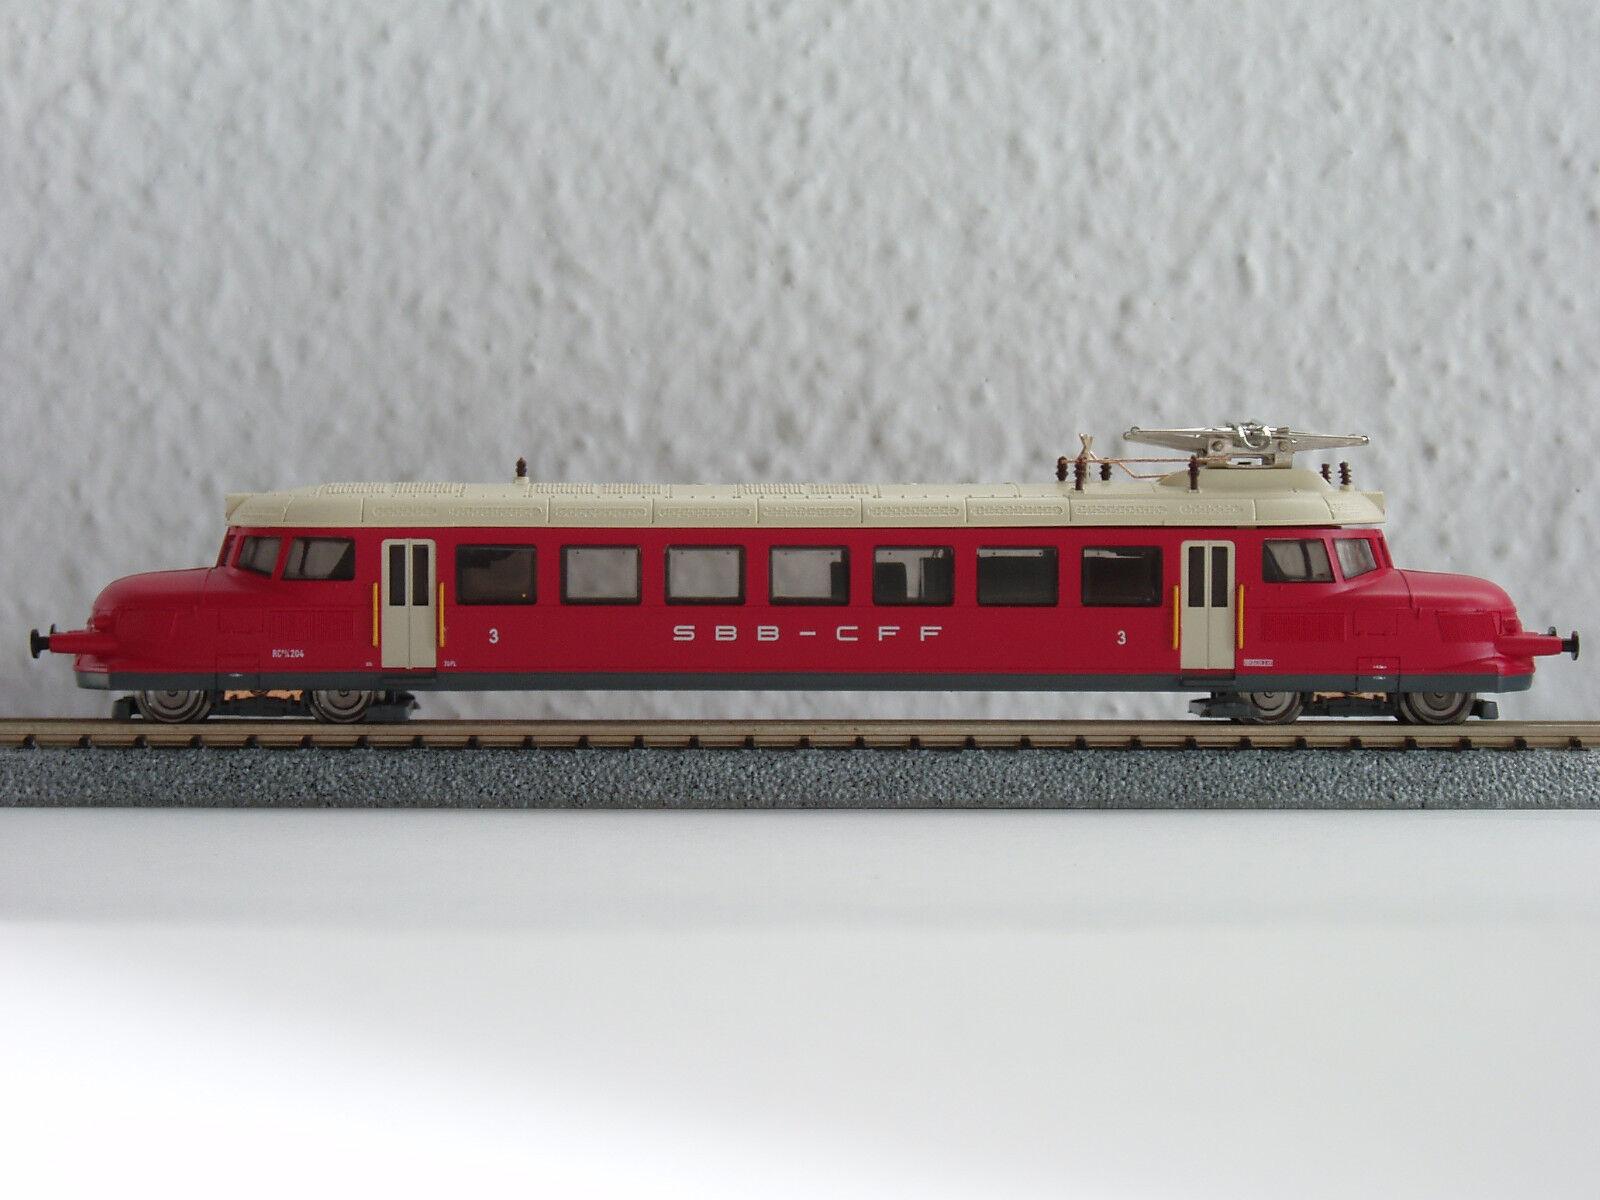 SBB tren 2 4 204  himbeerrojo  Hobbytrain h2643 (2163)